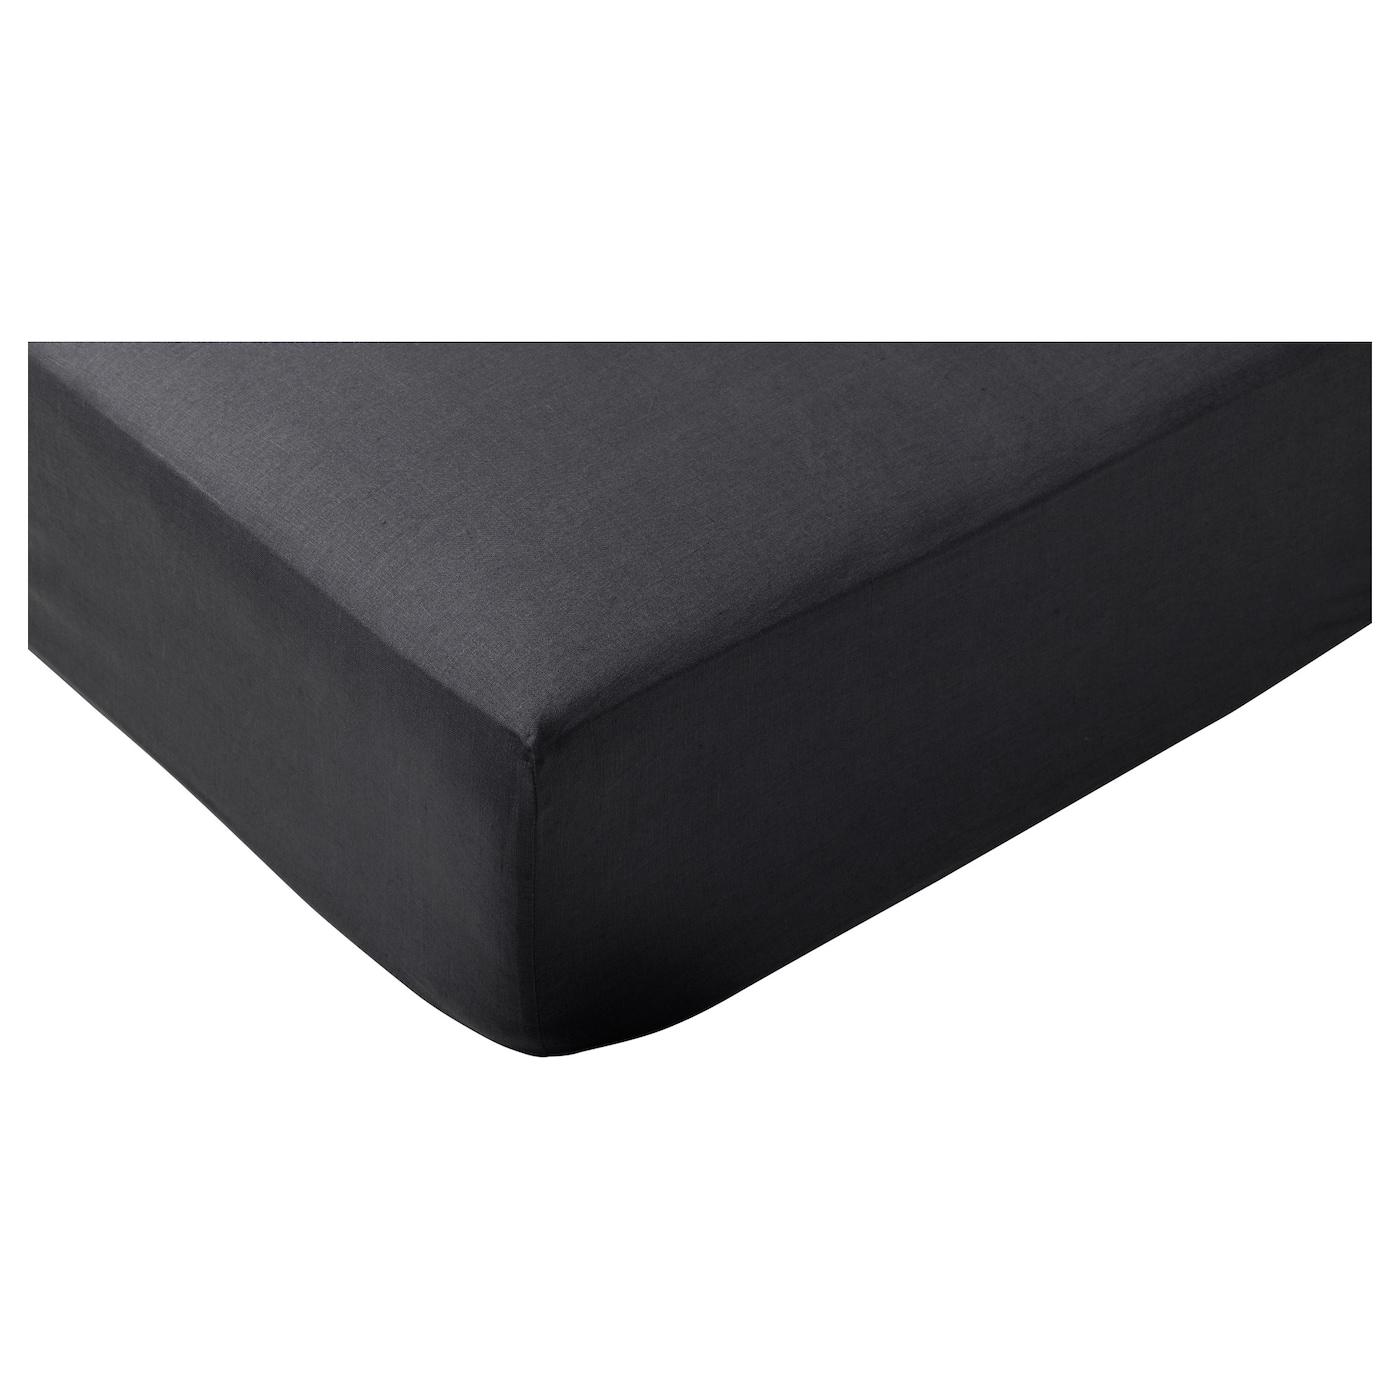 puderviva taie d 39 oreiller gris fonc 50x60 cm ikea. Black Bedroom Furniture Sets. Home Design Ideas